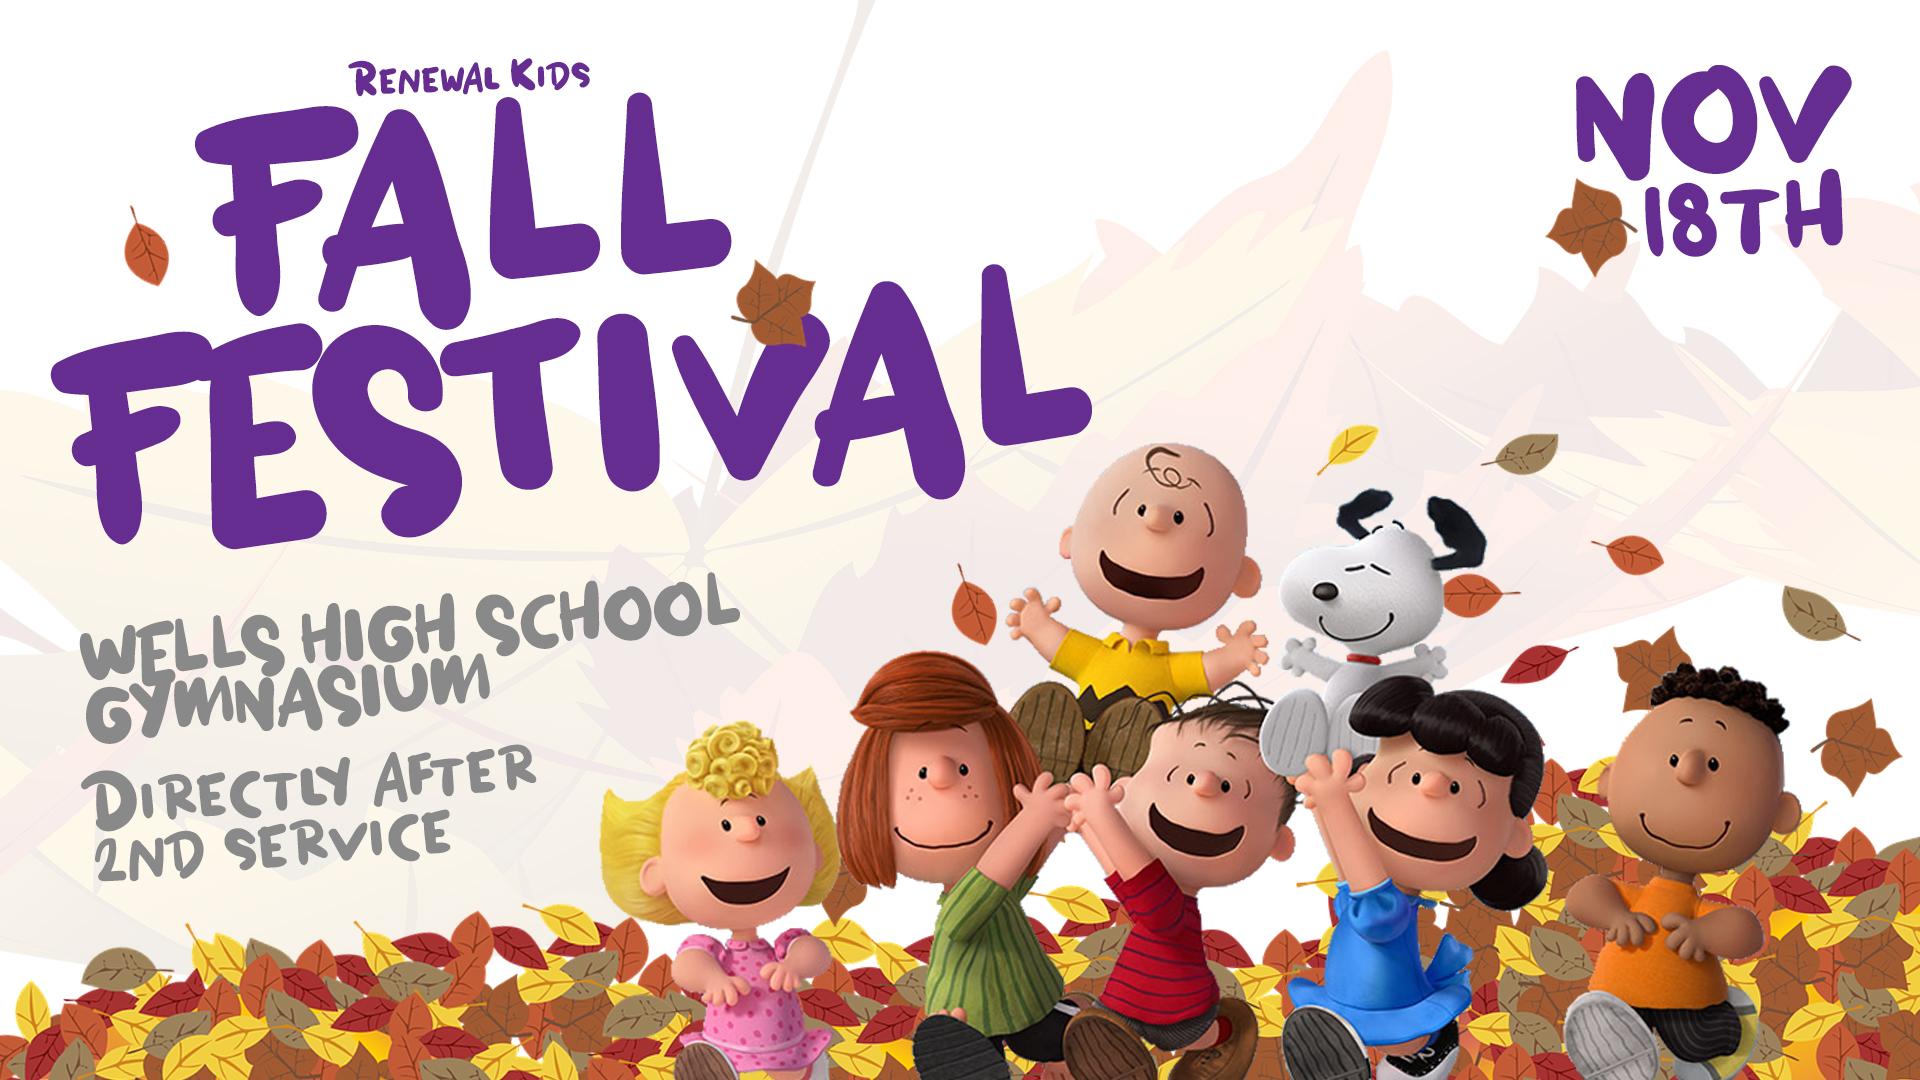 RCC Fall Festival 2018.jpg